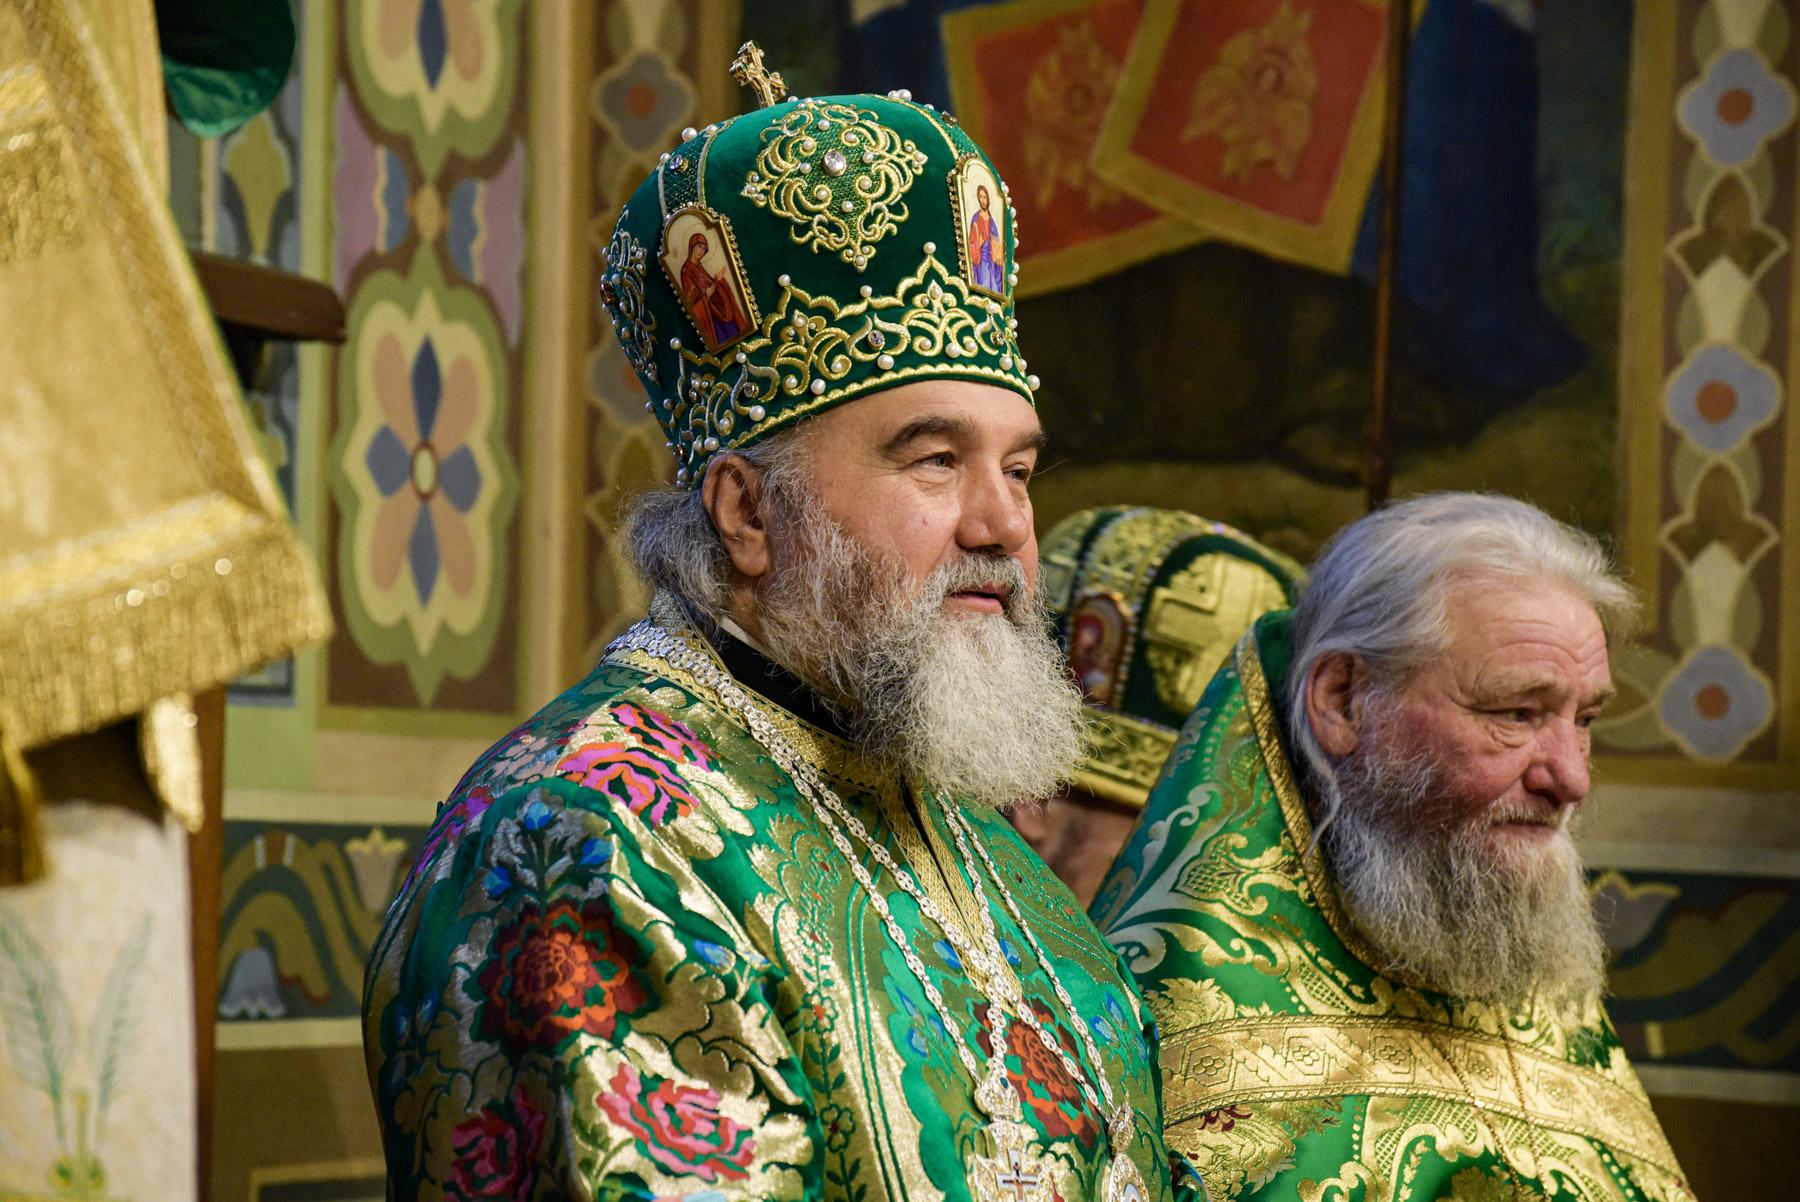 photos of orthodox christmas 0129 2